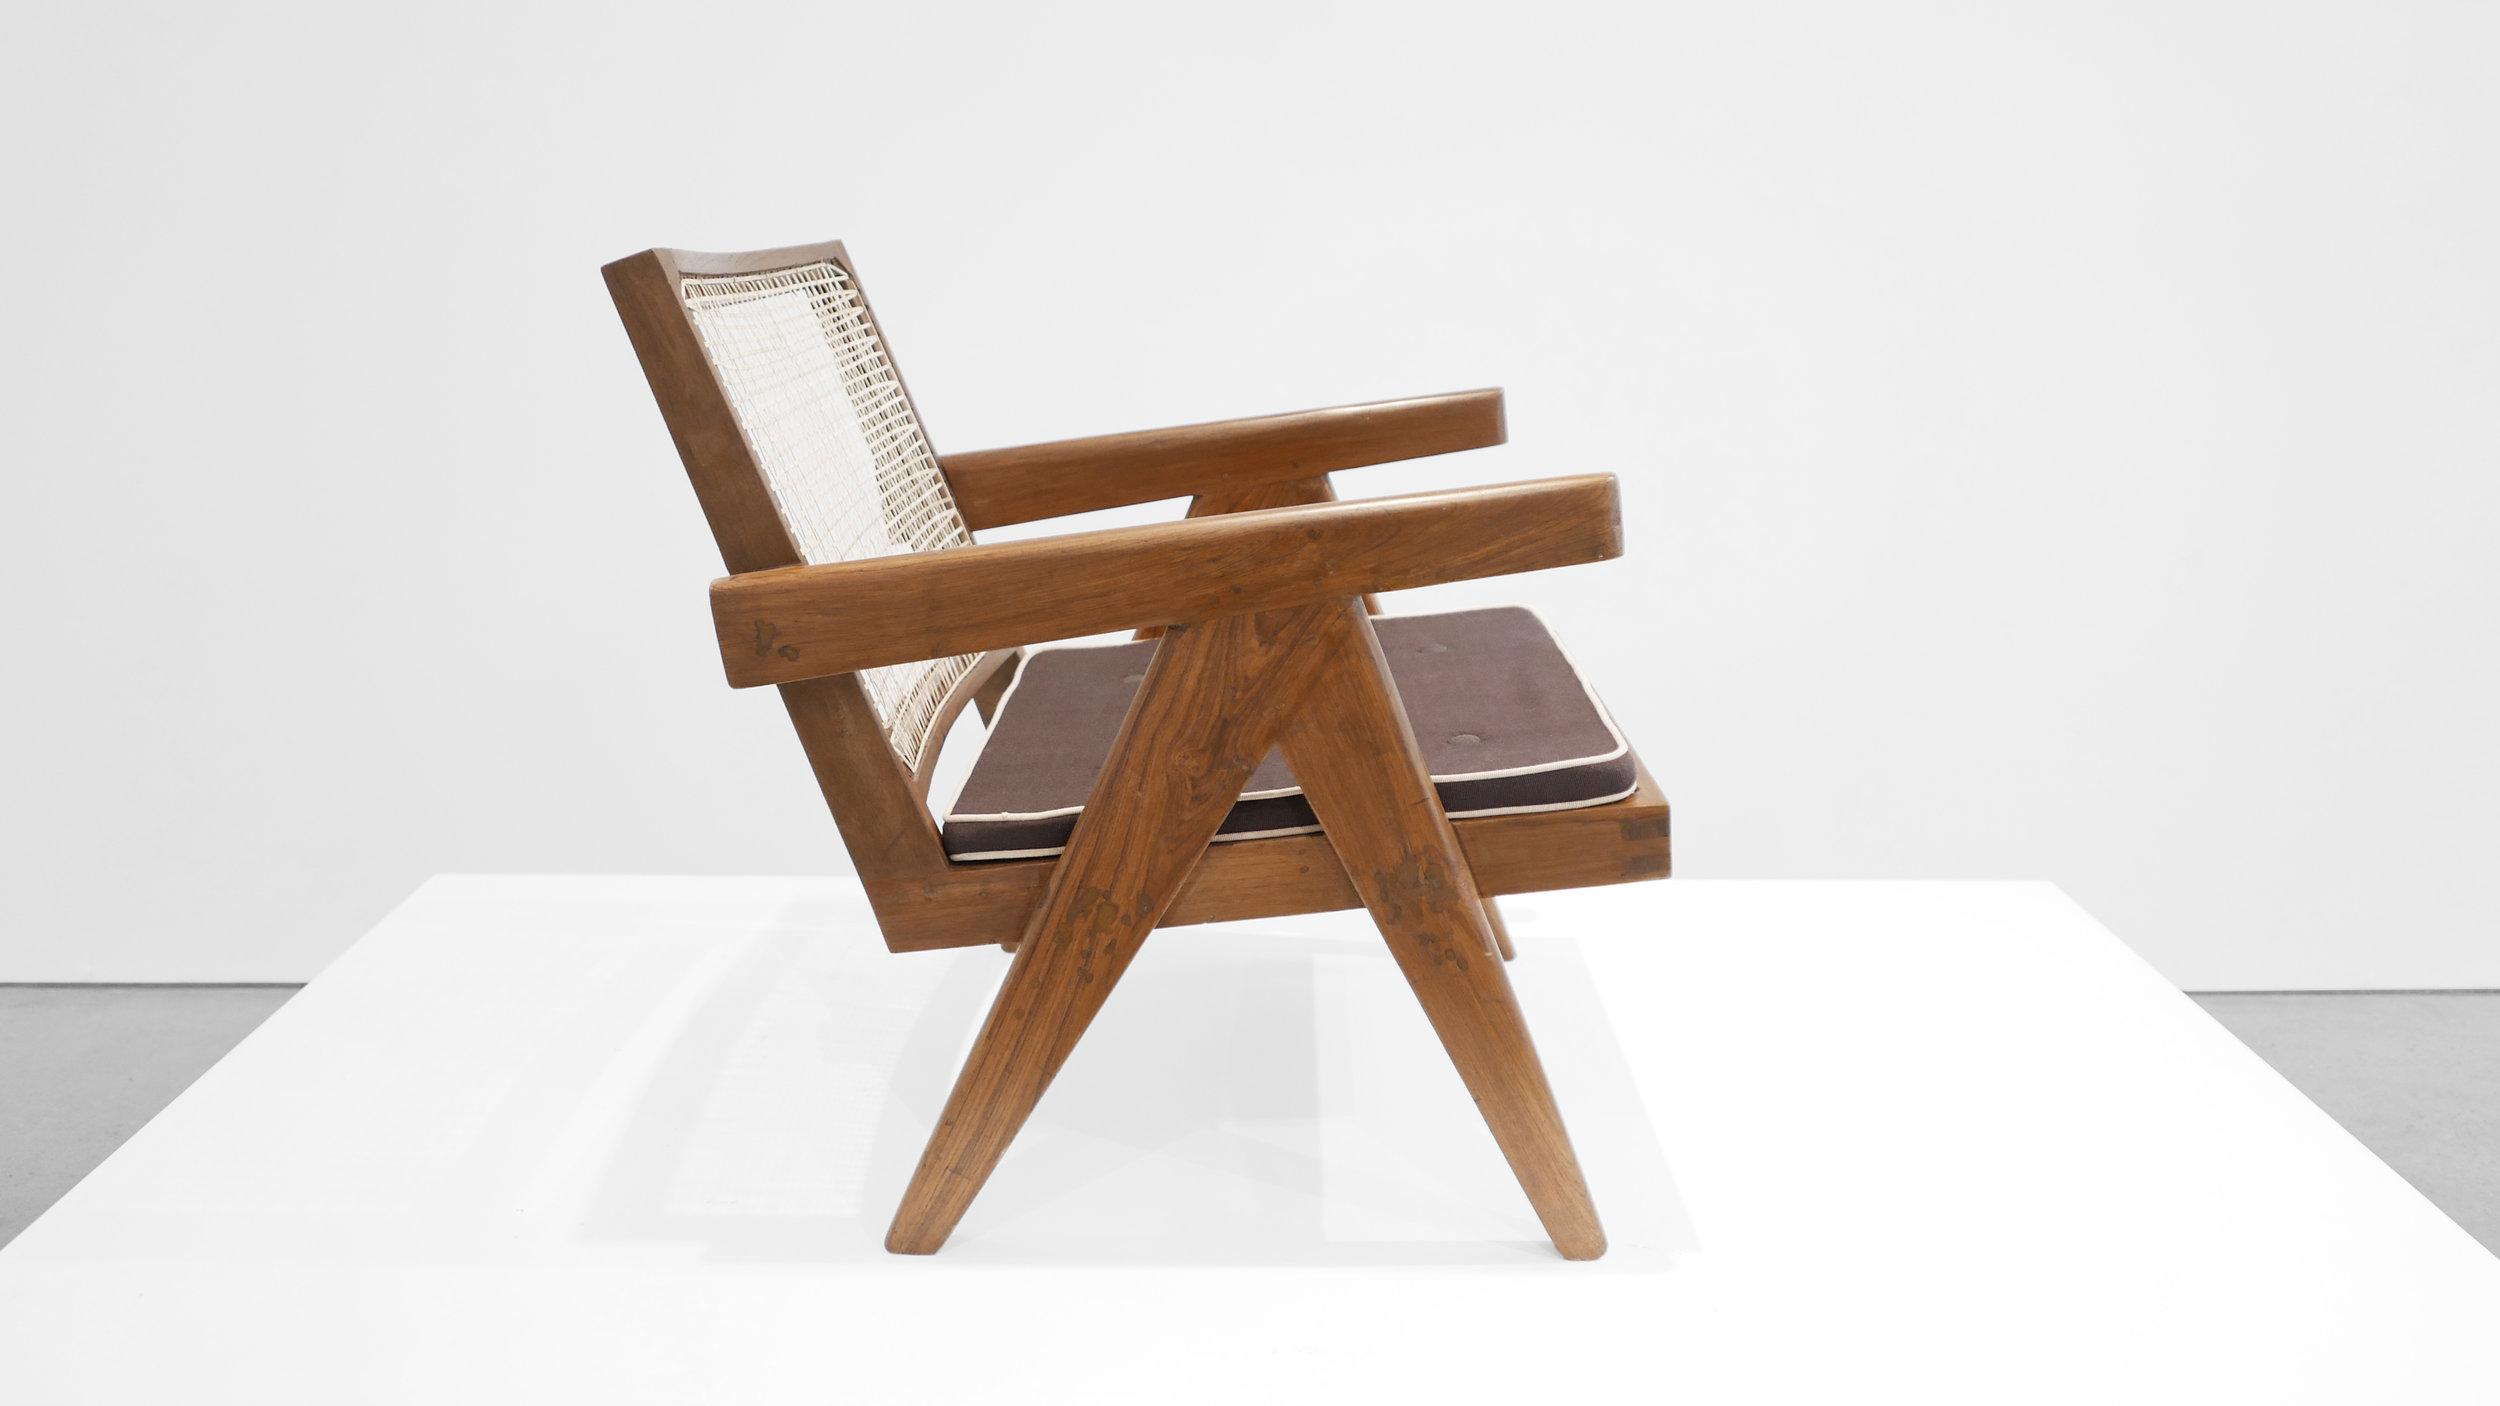 Pierre Jeanneret, Low lounge chair, model PJ-SI-29-A, c. 1955, teak, cane, 24.5H x 20.5W x 29.5D inches_2.jpg